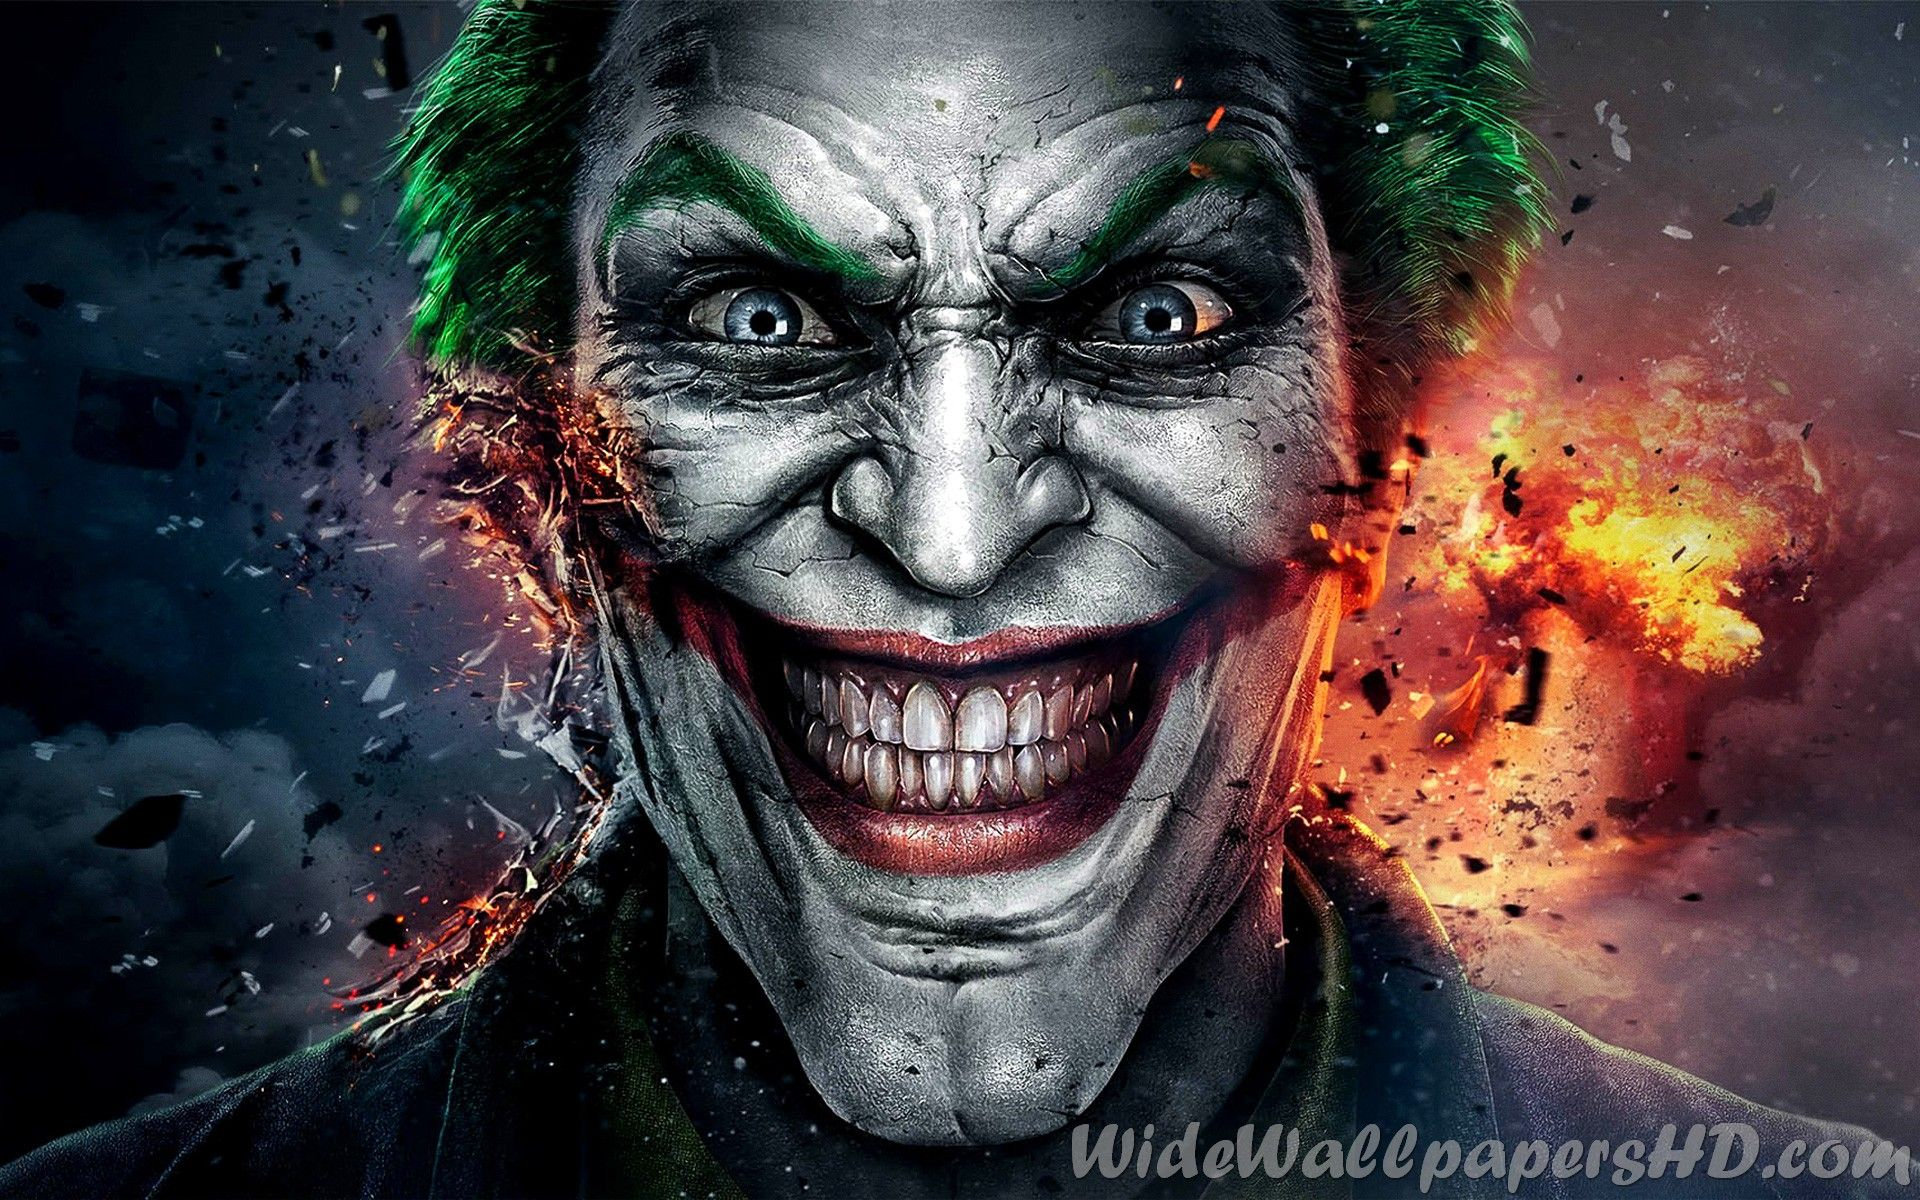 Imagen Del Joker Hd 4k Guason Batman Imagenes De Joker Y